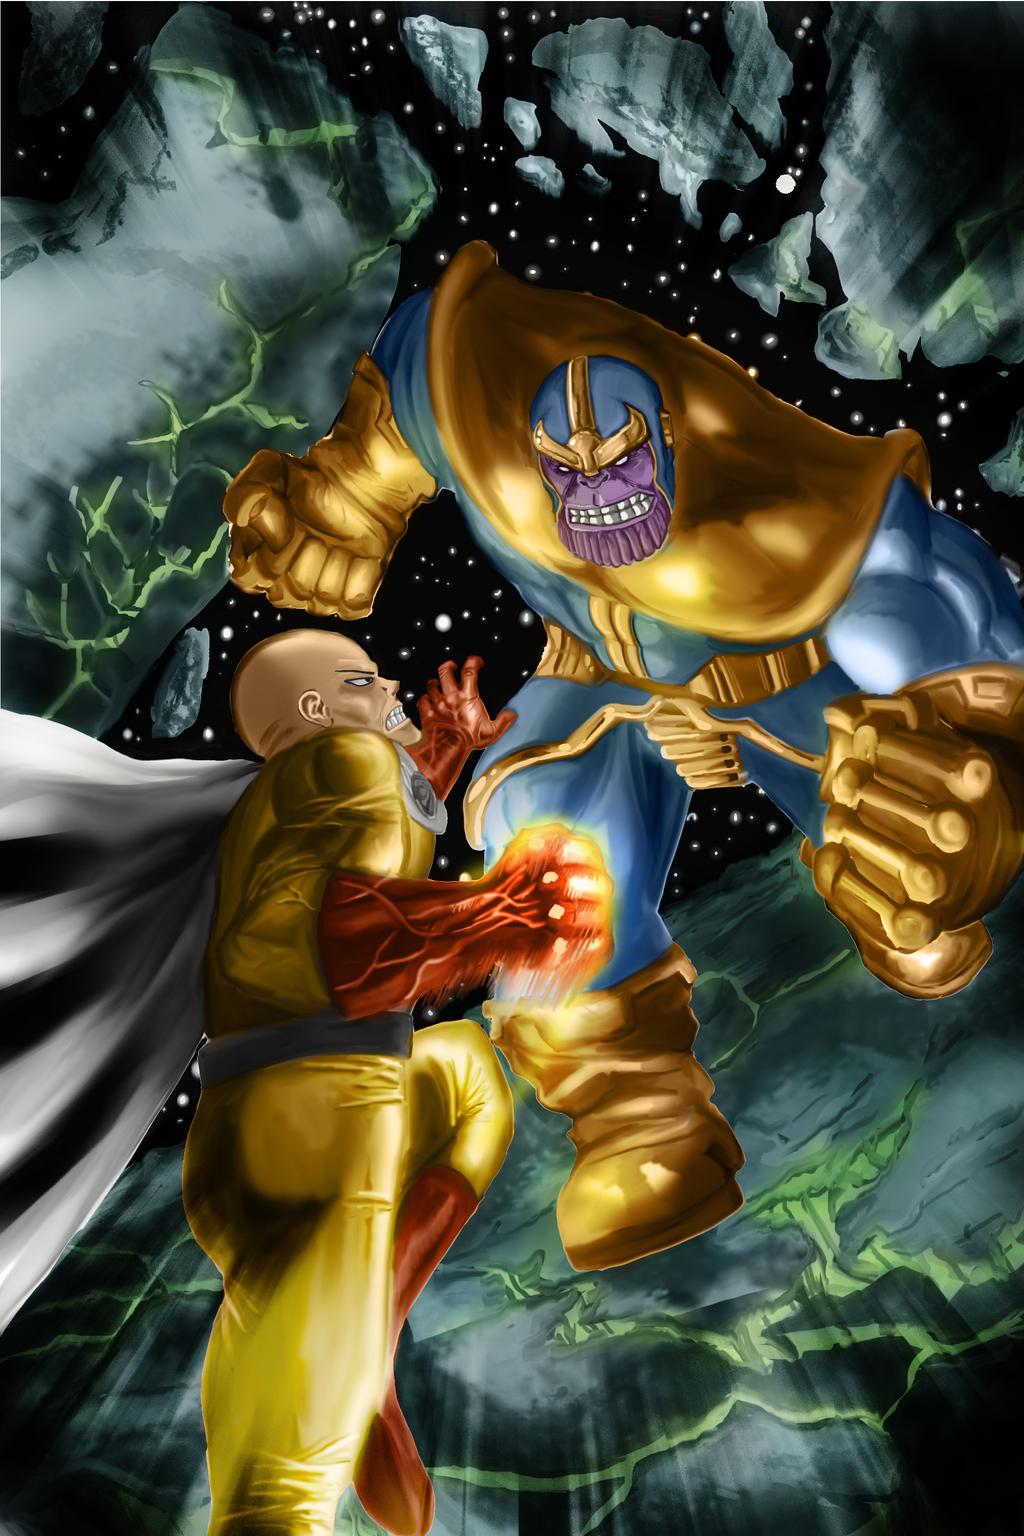 Anime Characters Vs Thanos : Saitama vs thanos by camposbane on deviantart